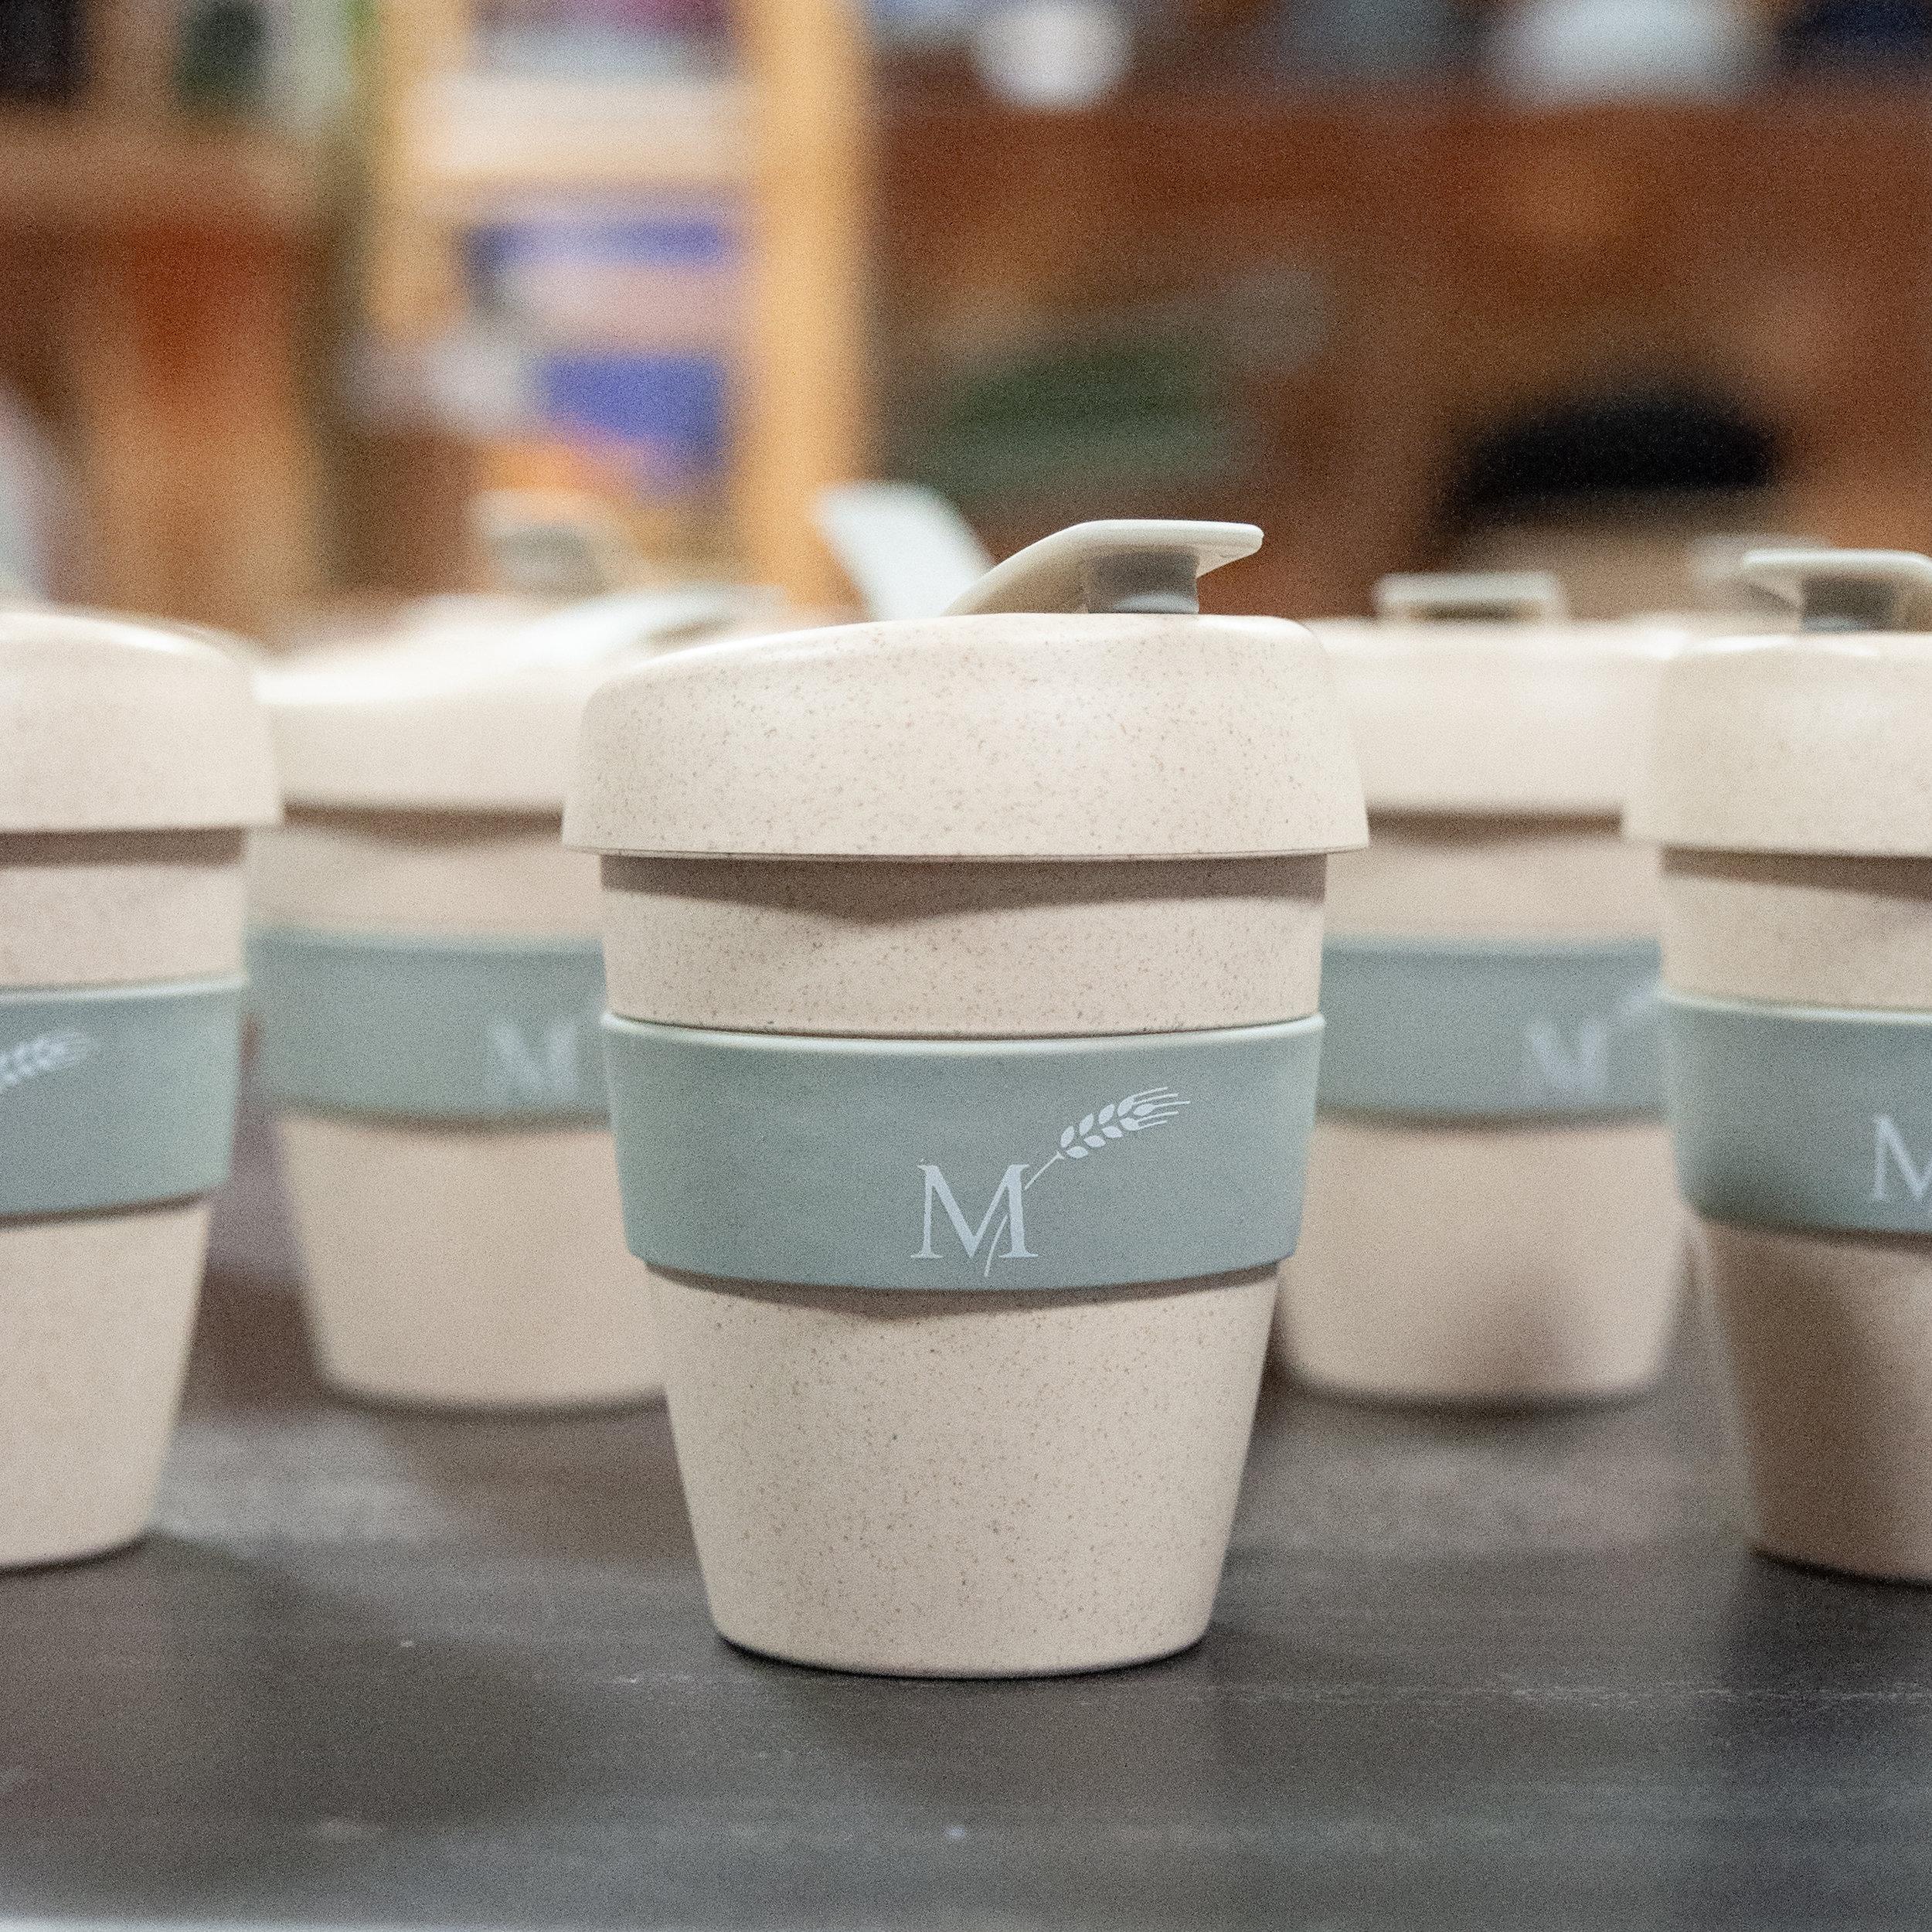 Milbrook-Promotional-Keep-cups.jpg